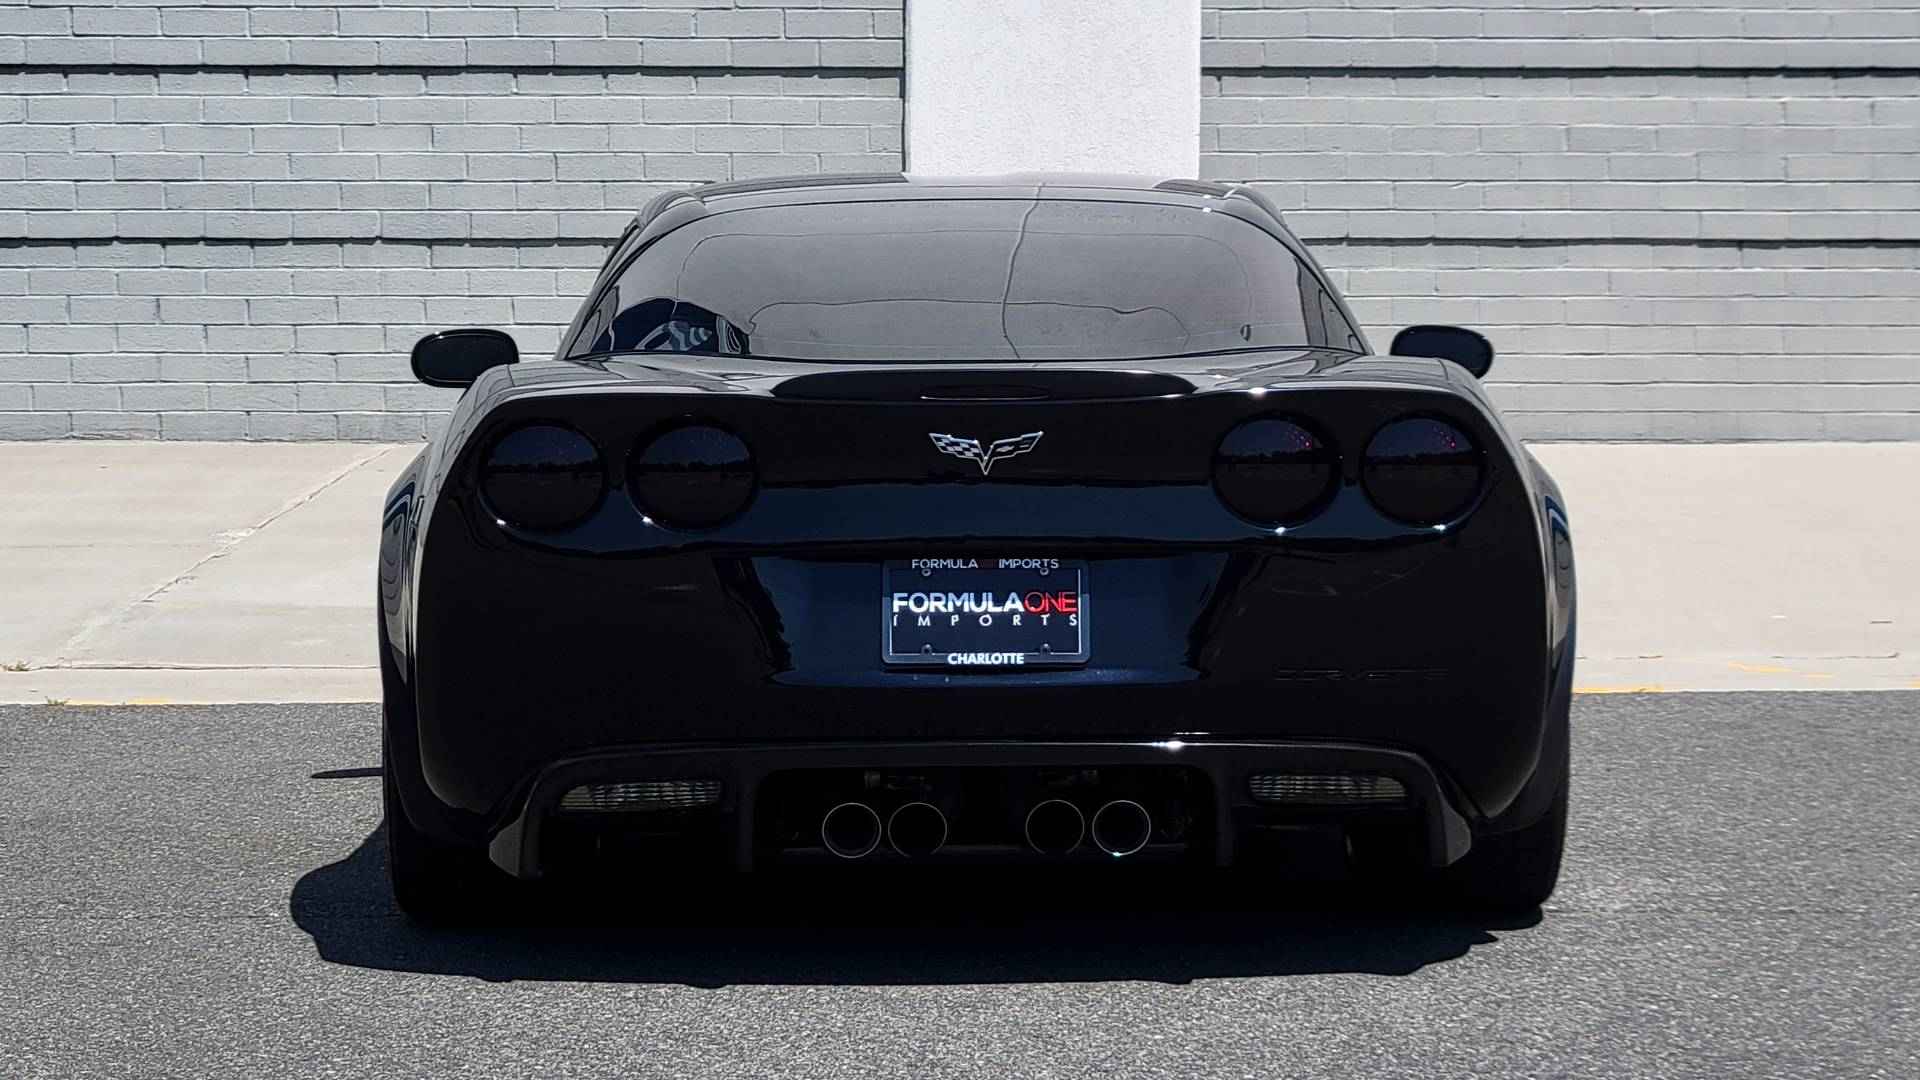 Used 2007 Chevrolet CORVETTE Z06 2LZ / 7.0L 427 V8 / 6-SPD MAN / BOSE / POLISHED WHEELS for sale Sold at Formula Imports in Charlotte NC 28227 19